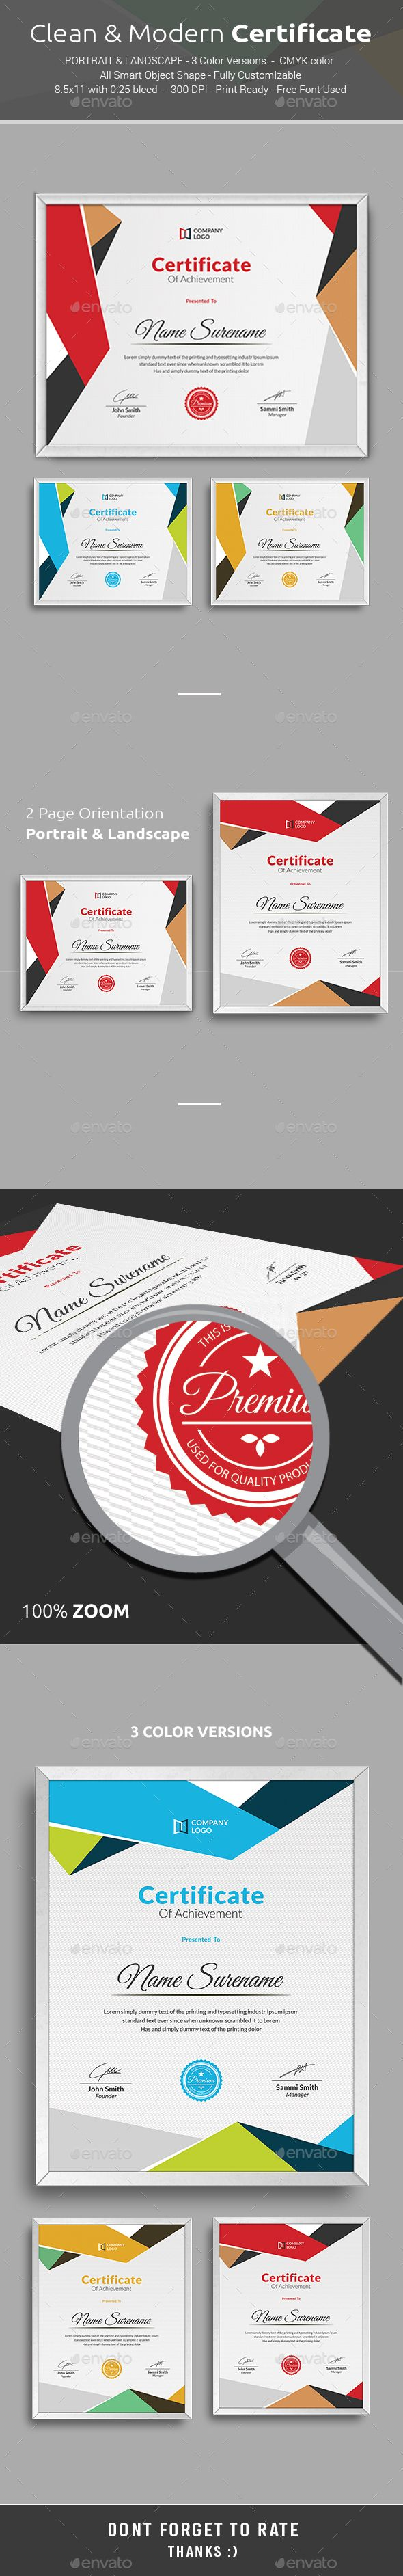 Certificate Template PSD. Download here: http://graphicriver.net/item/certificate/13757280?ref=ksioks